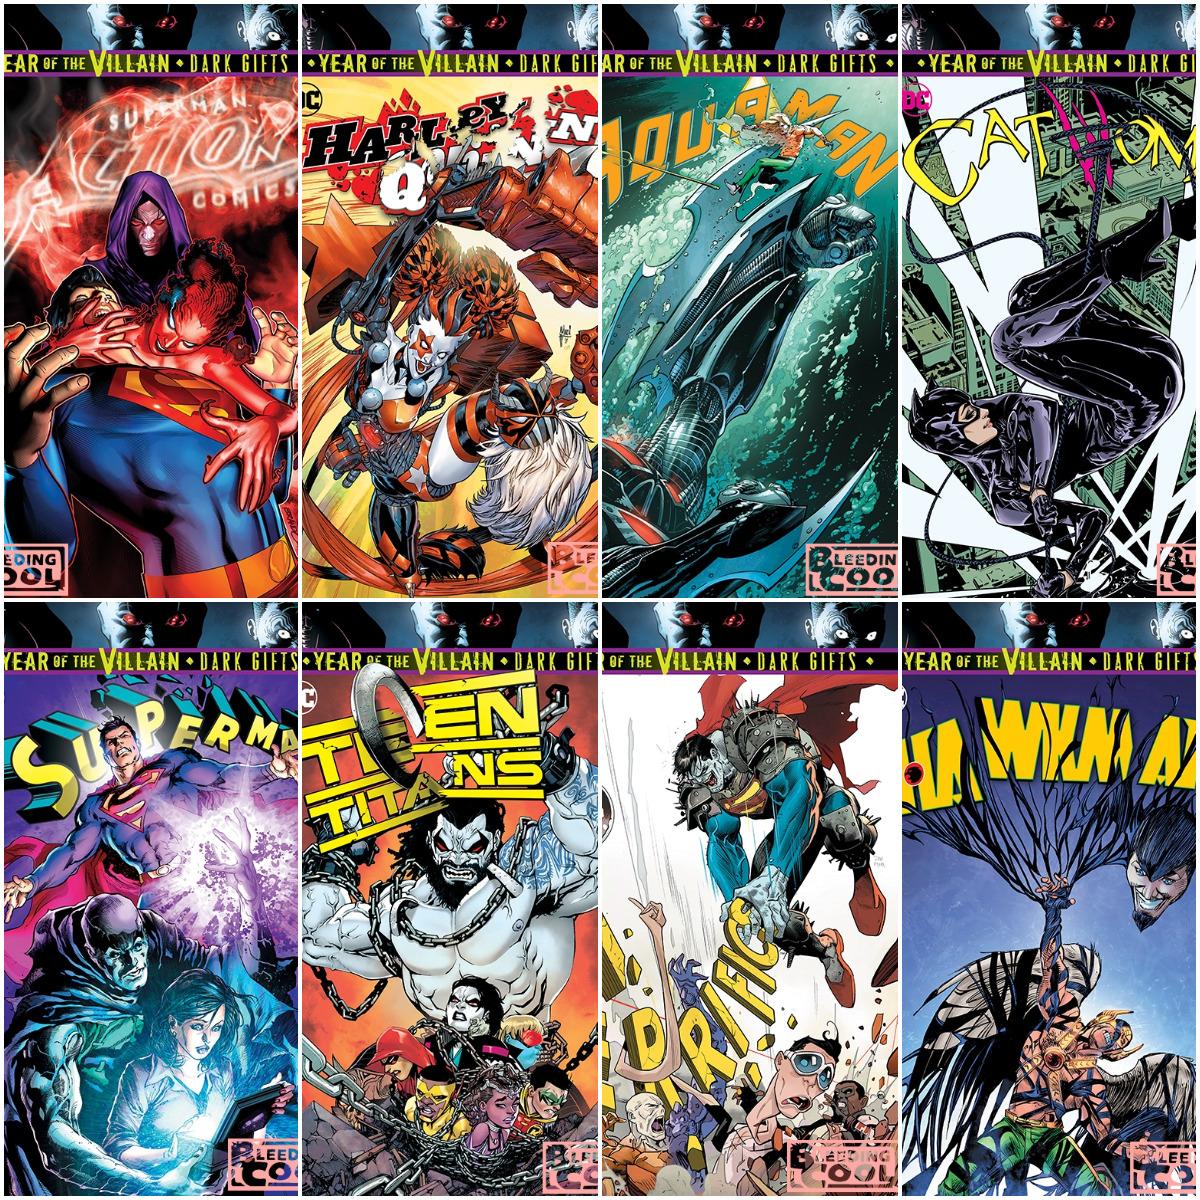 NIGHTWING #63 YOTV DARK GIFTS DC COMICS